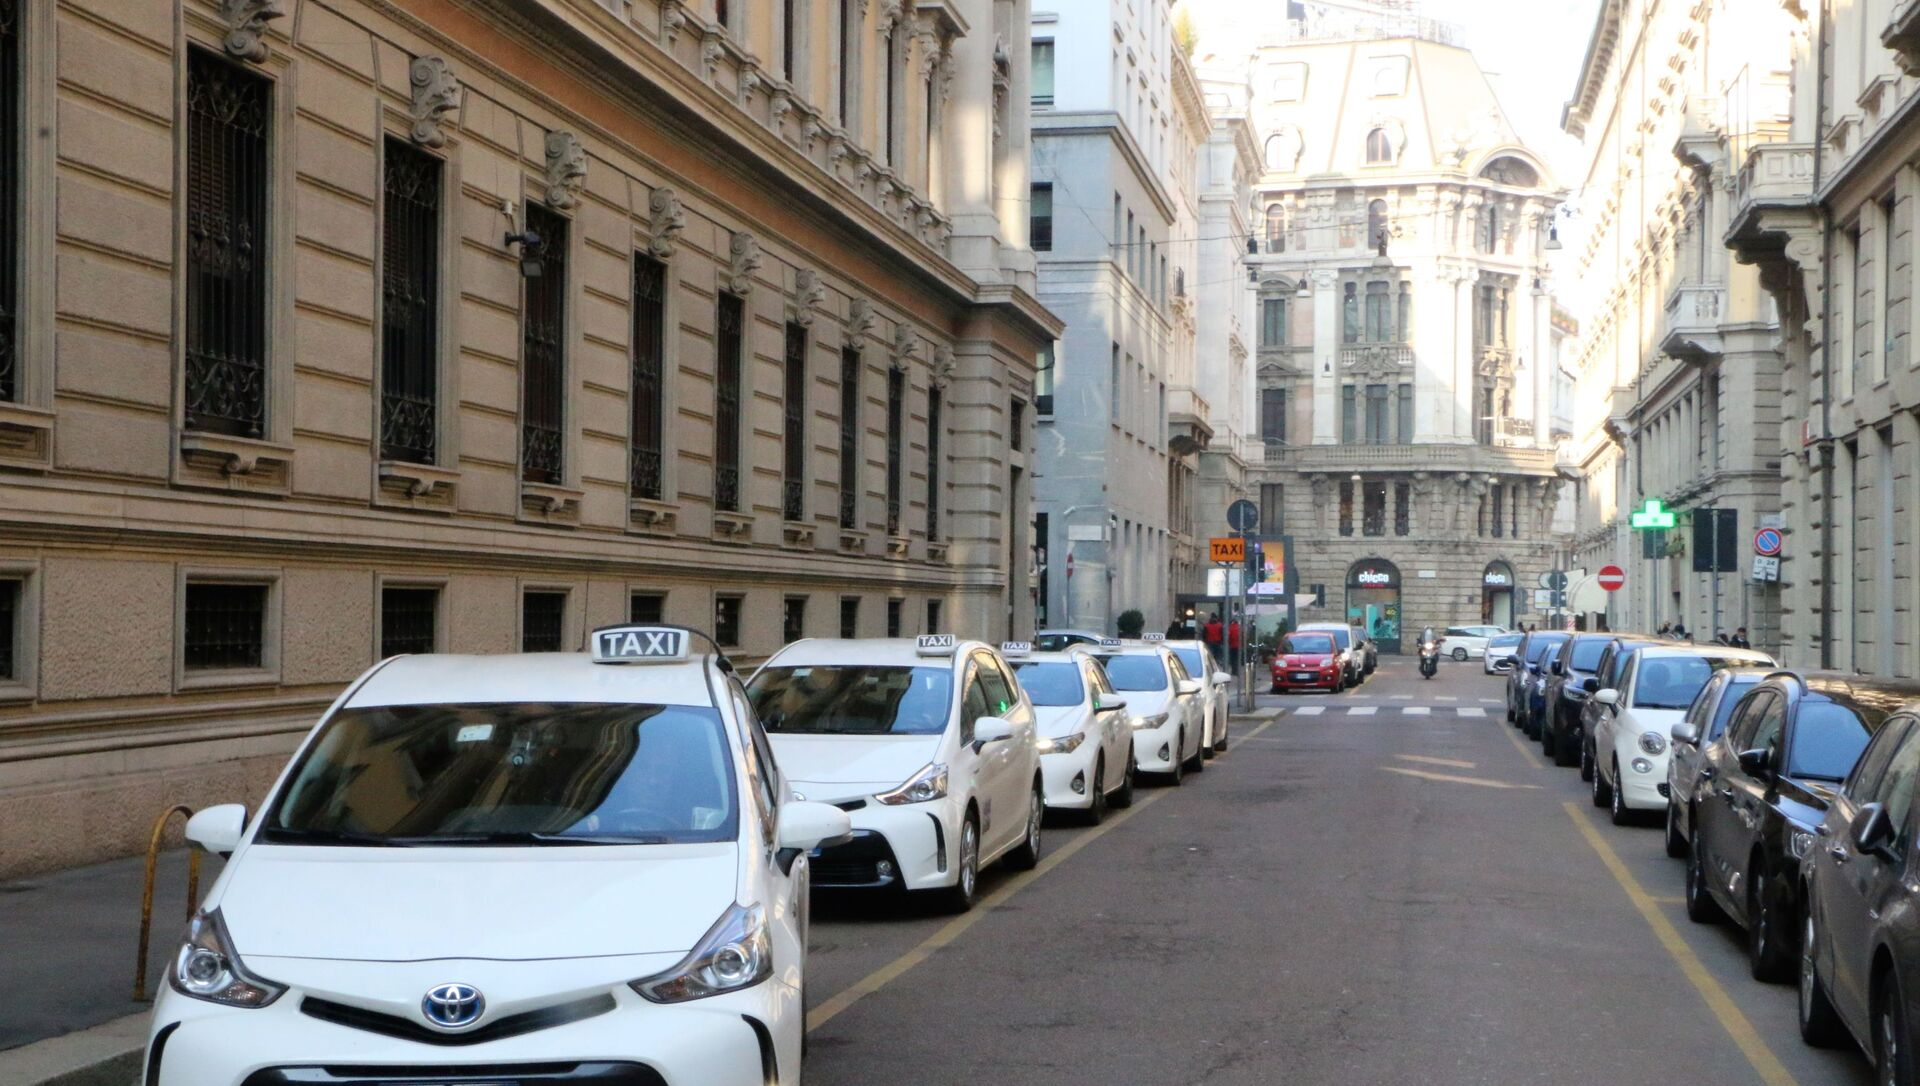 Taxi in una strada di Milano - Sputnik Italia, 1920, 28.02.2021